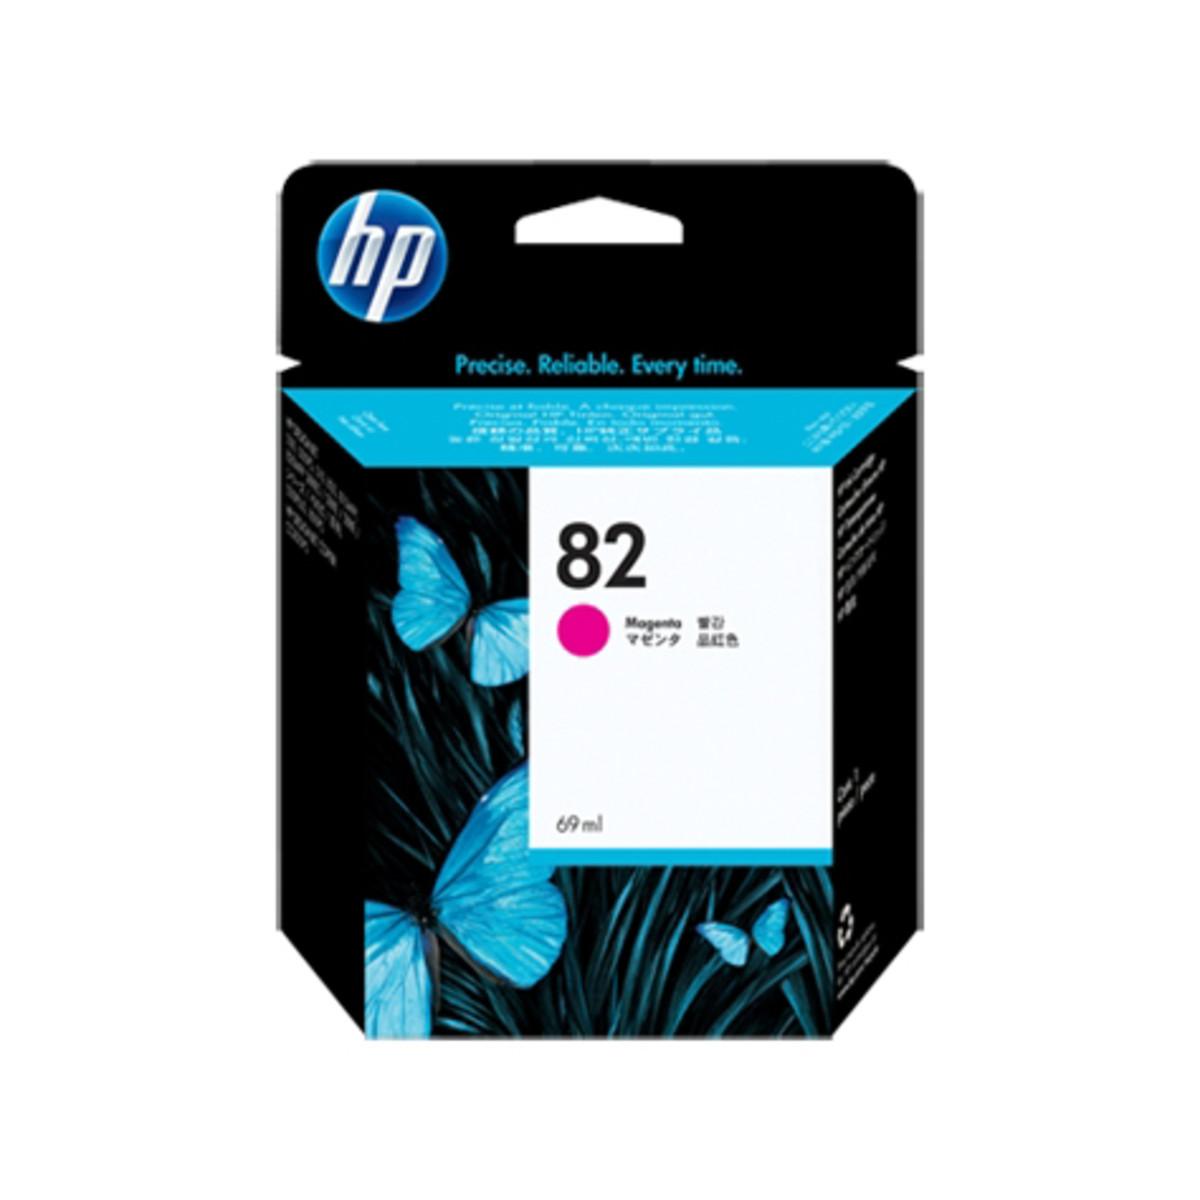 HP 82 (C4912A) Magenta Ink Cartridge